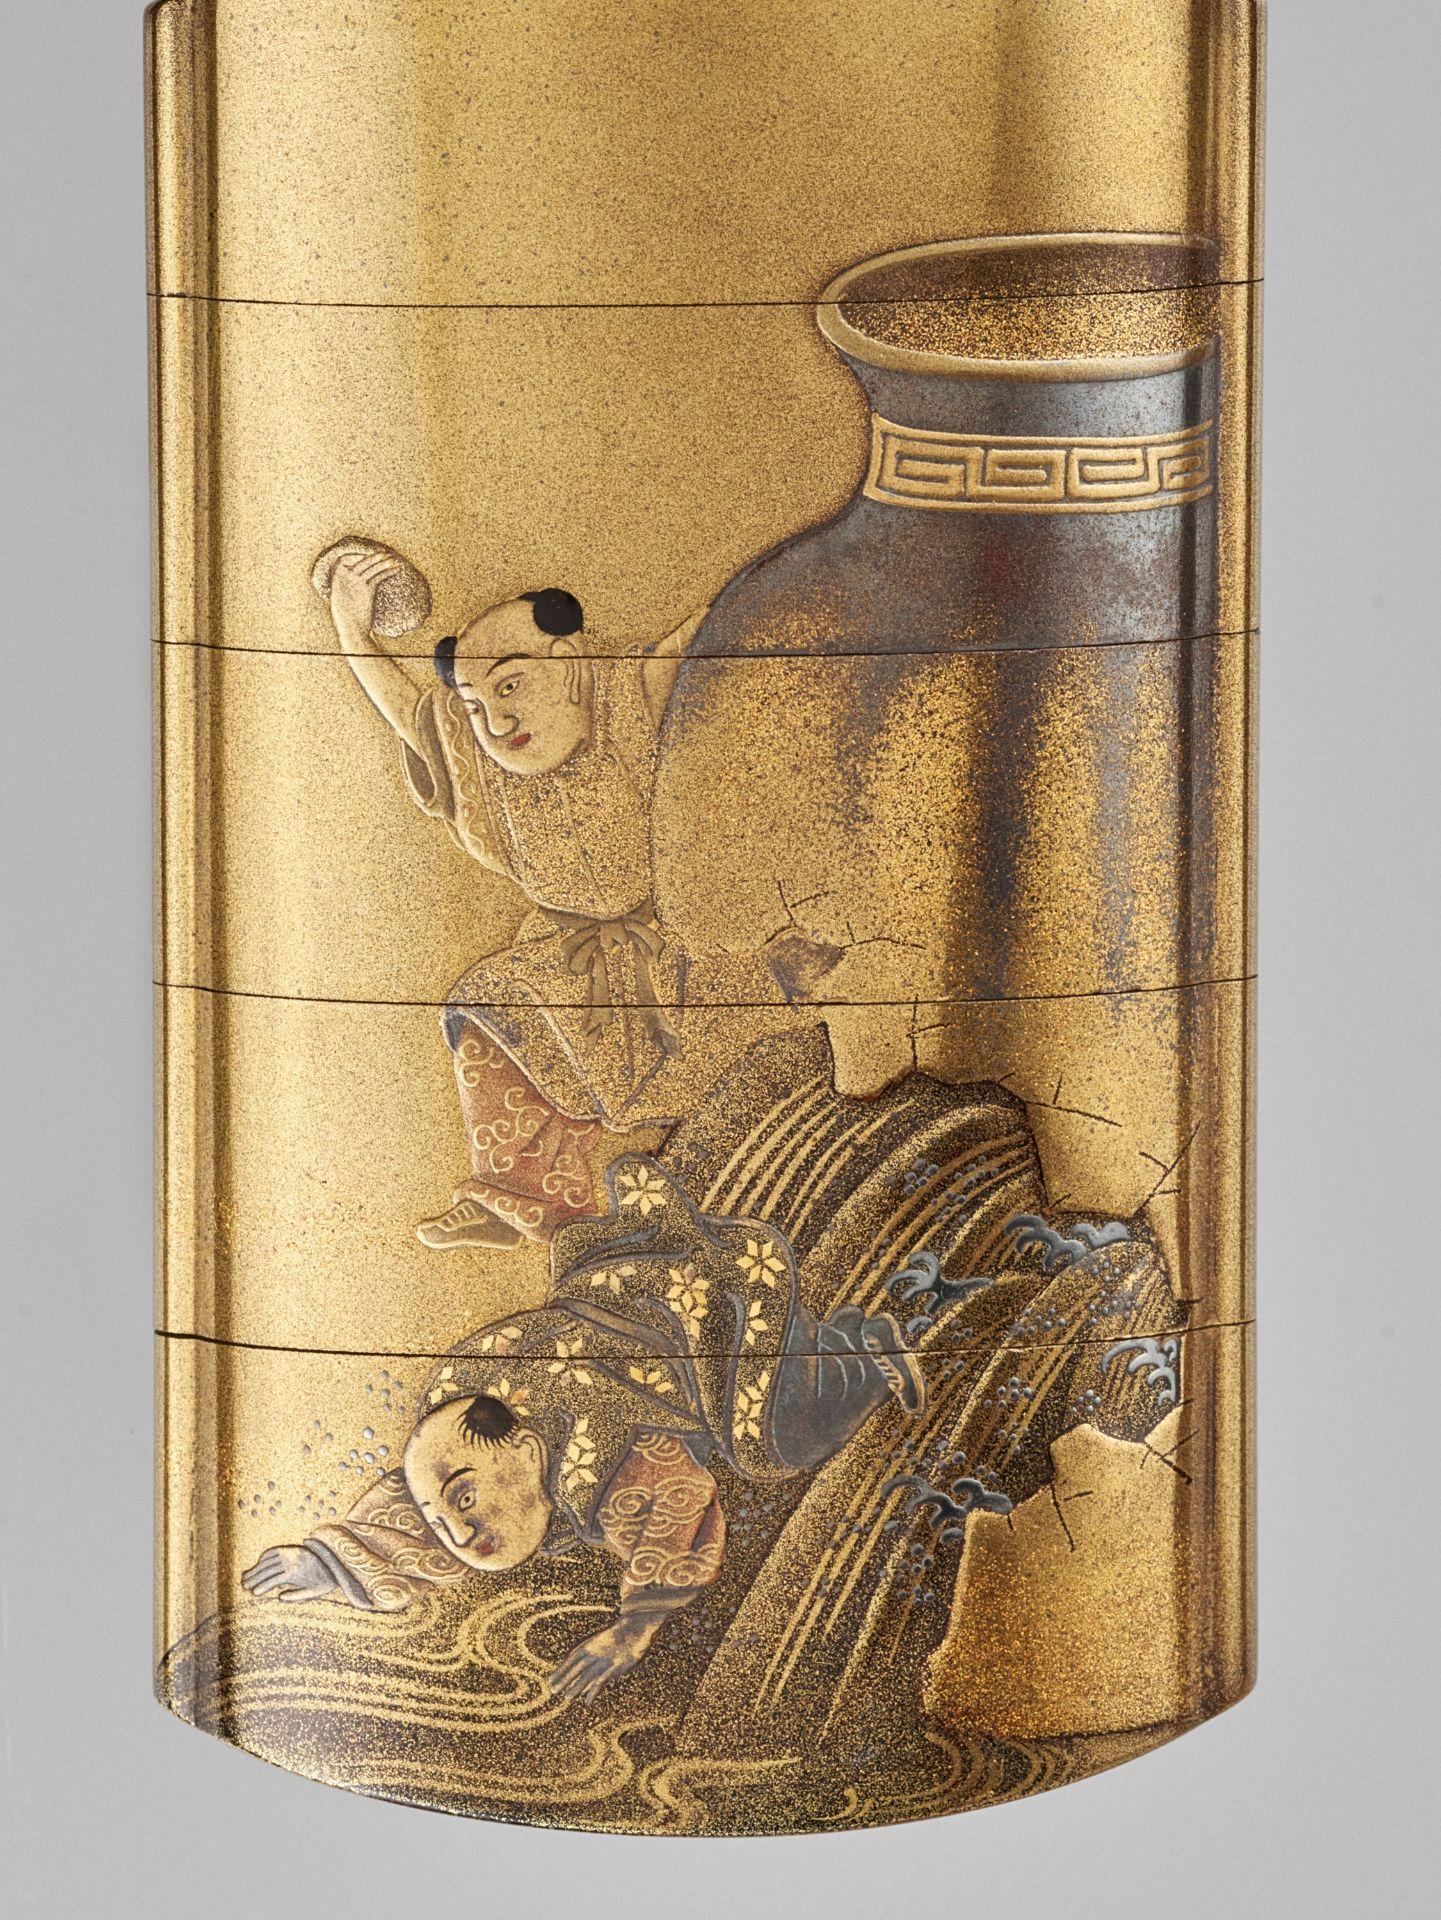 JOKASAI: A FINE GOLD LACQUER FOUR-CASE INRO DEPICTING SHIBA ONKO - Image 3 of 5